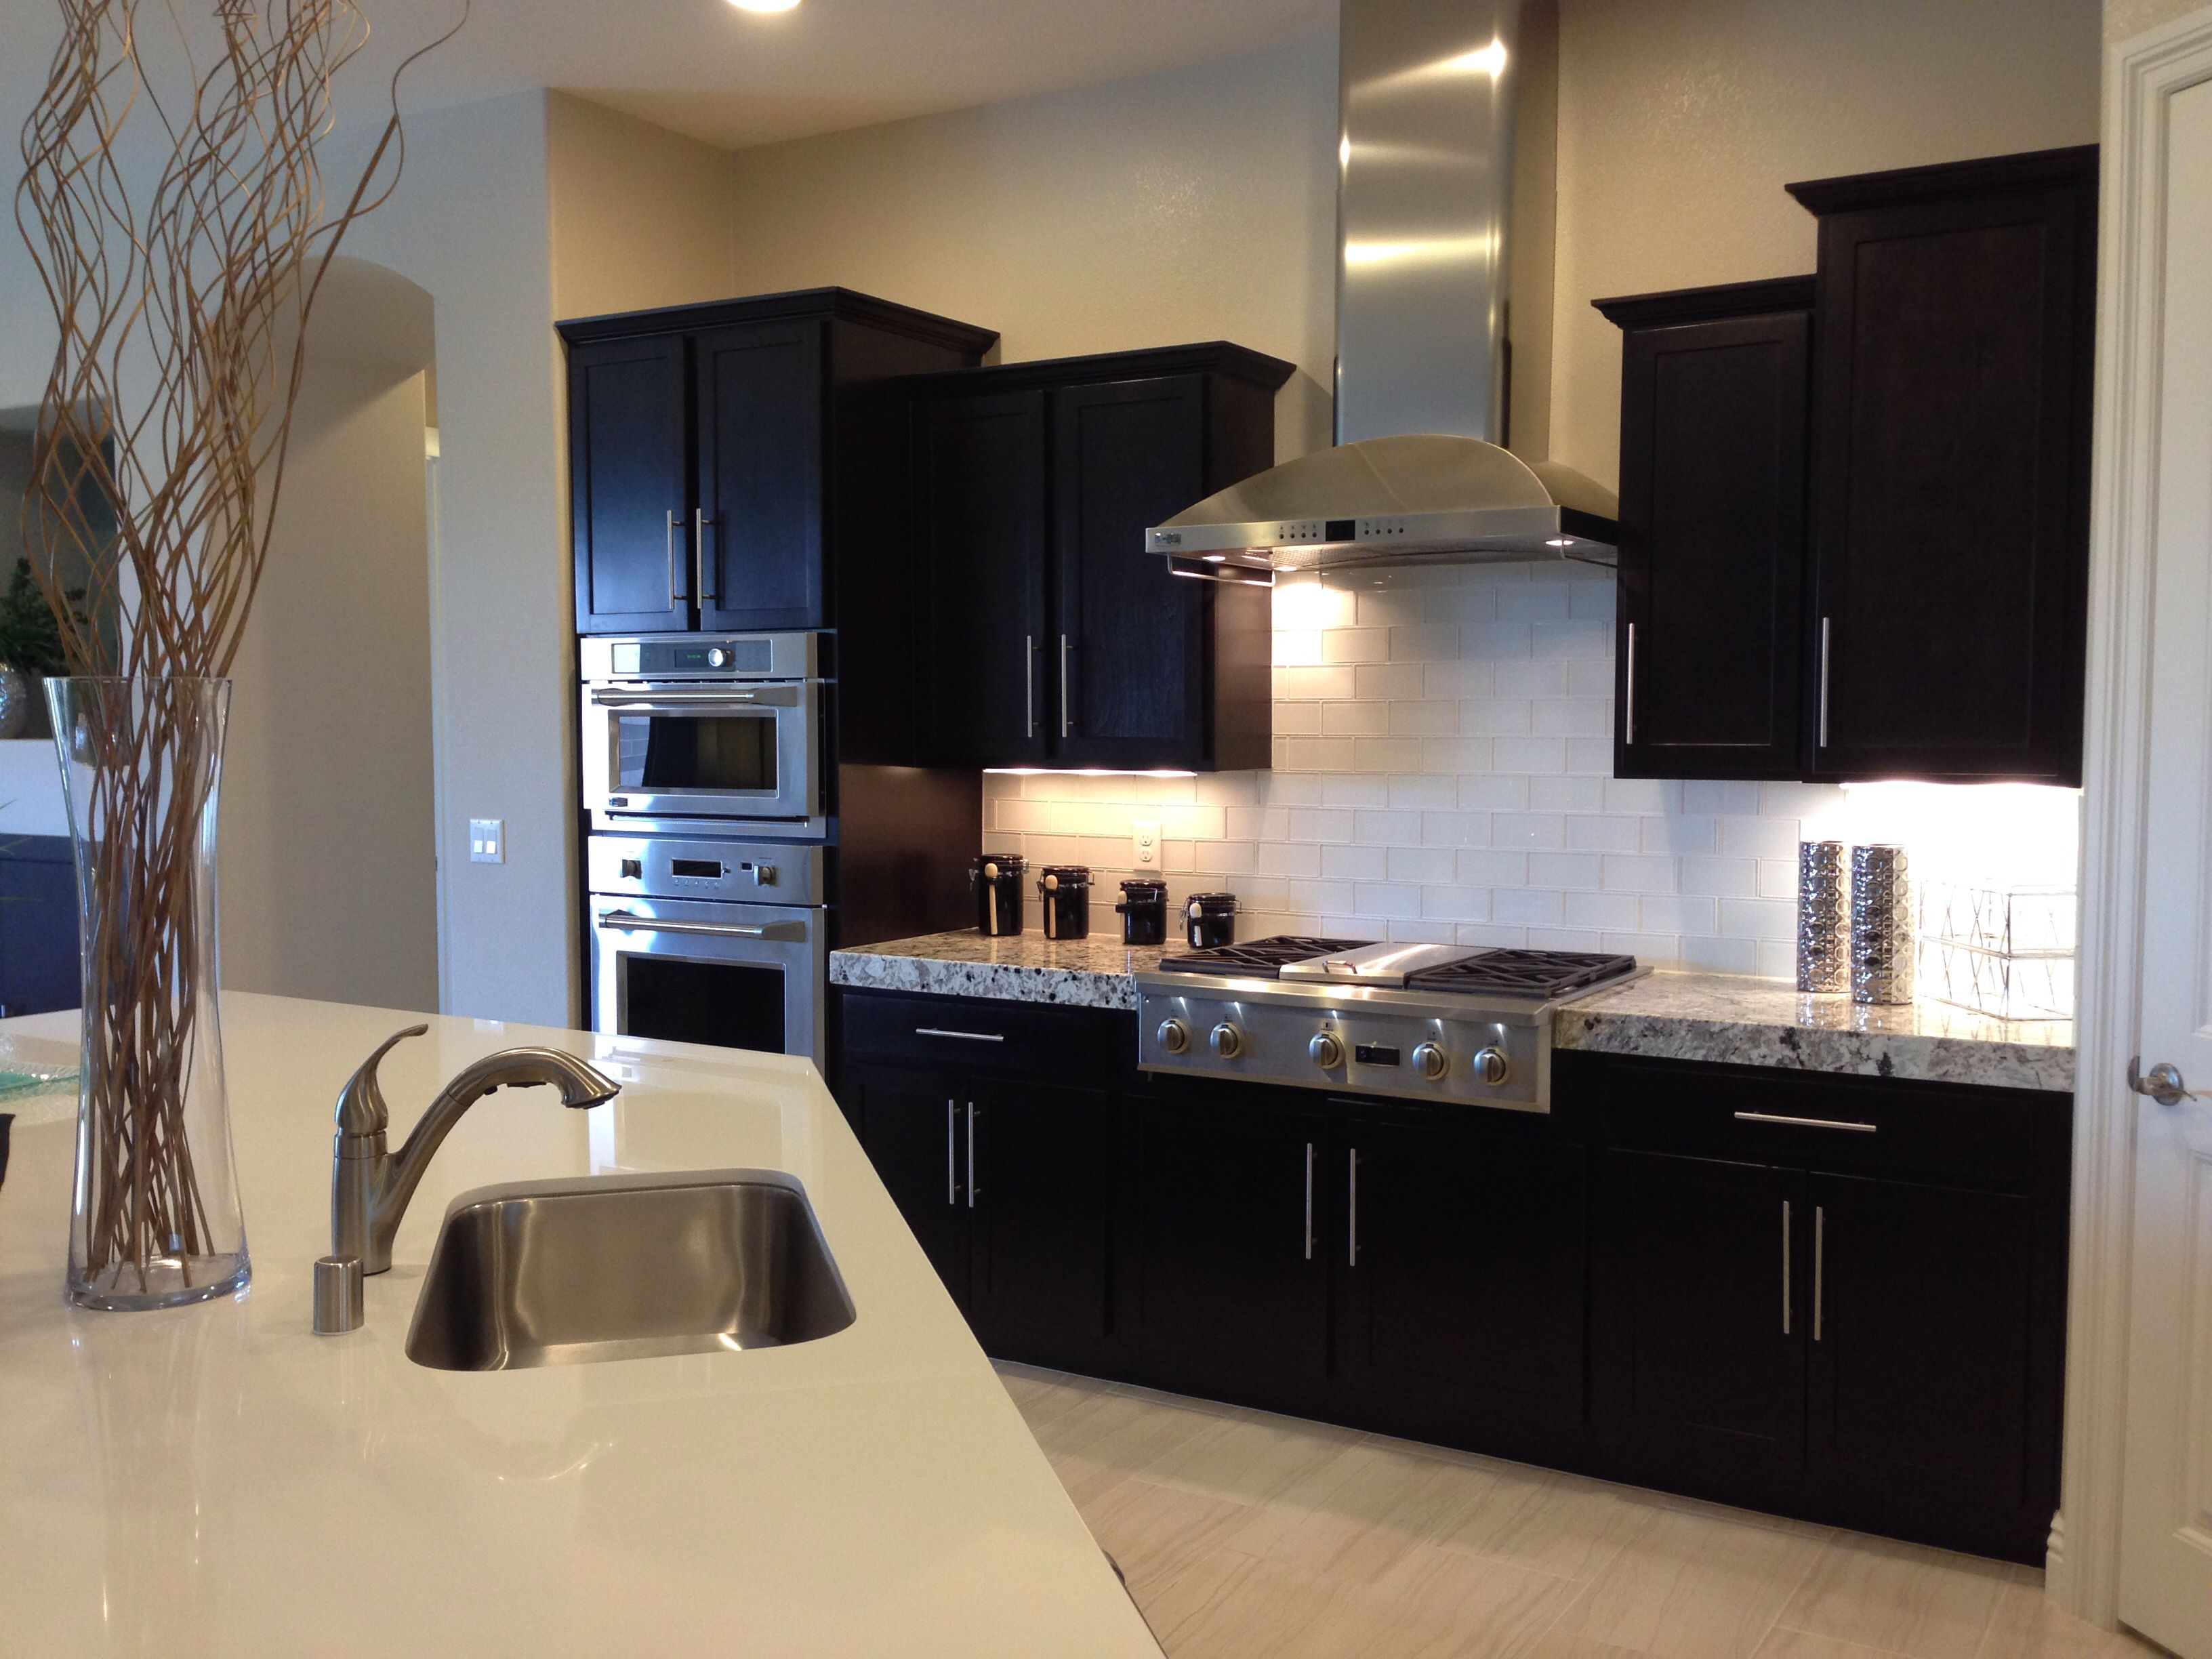 Dr Horton Kitchen Kitchen Design Kitchen Kitchen Cabinets